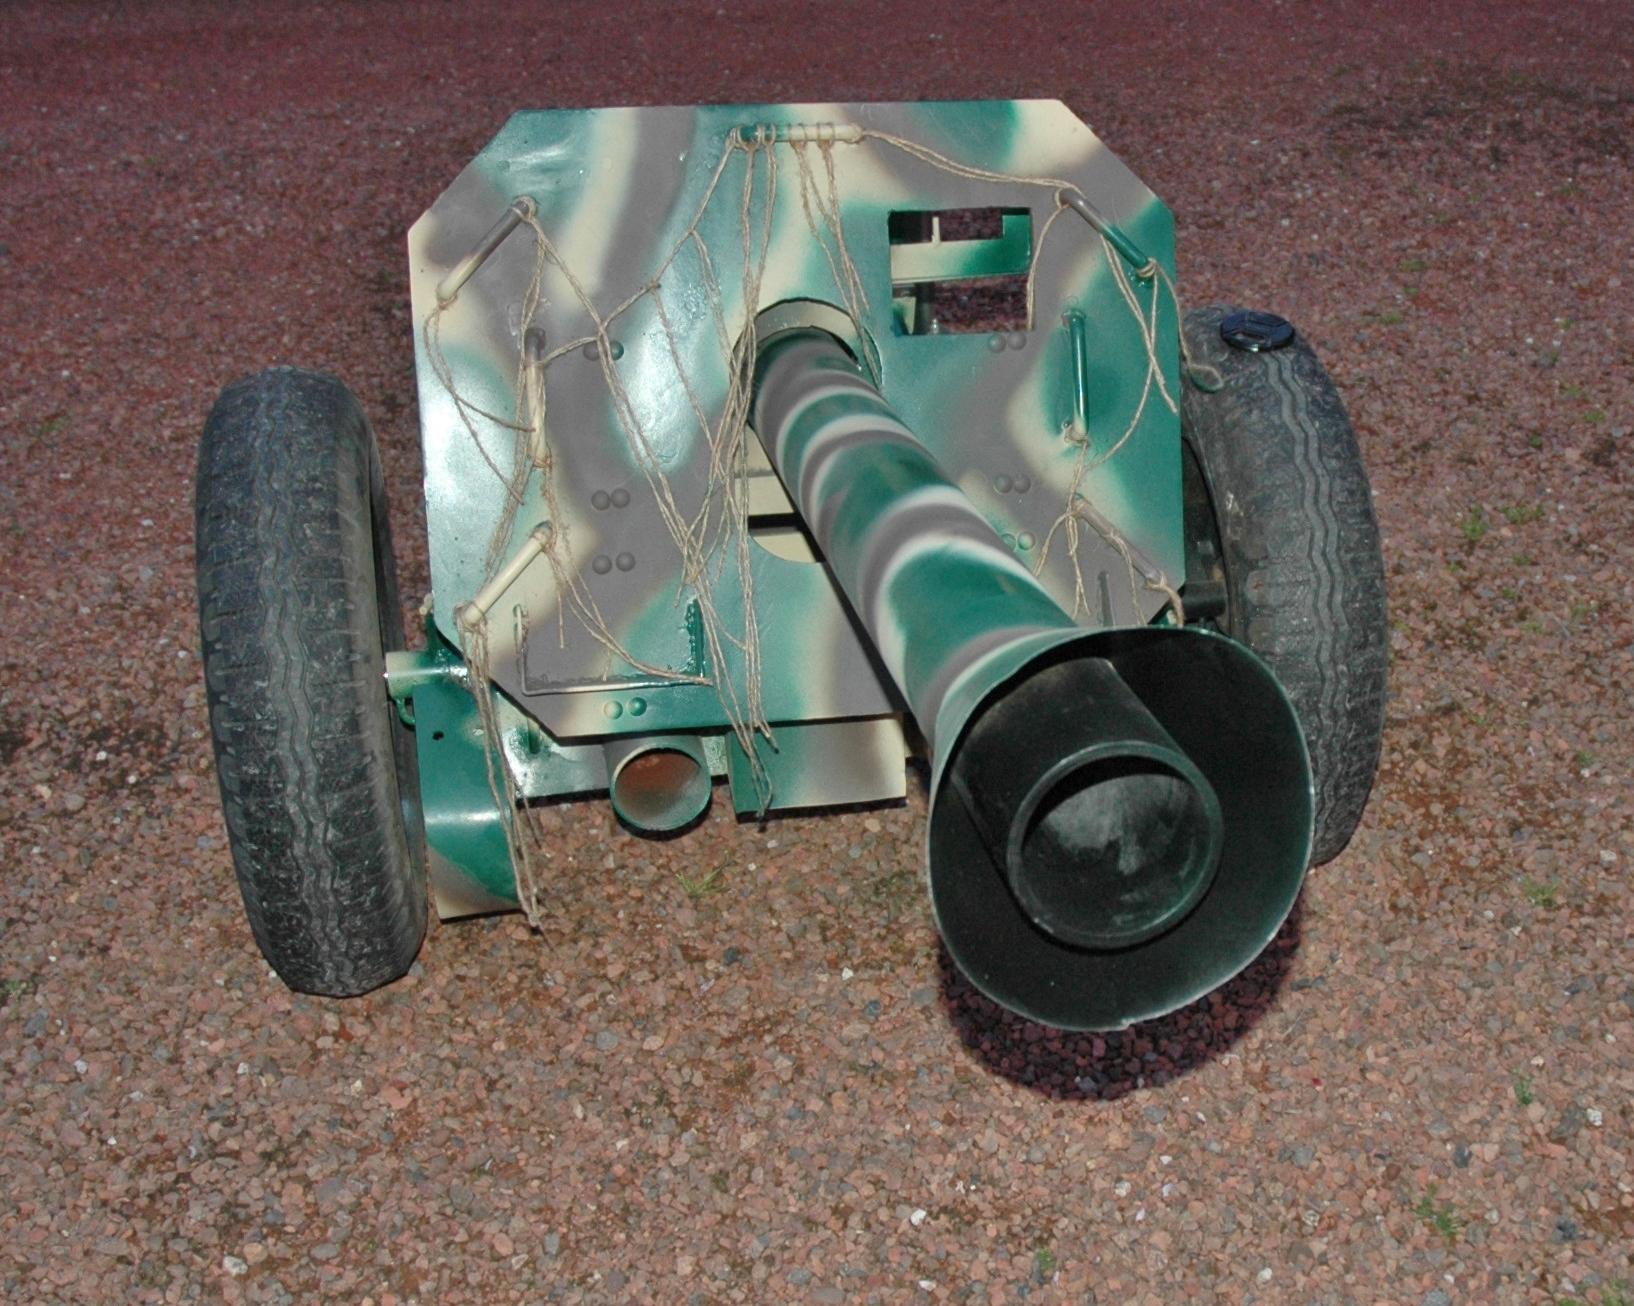 8.8 cm Raketenwerfer 43 - Page 2 Dsc0037qy